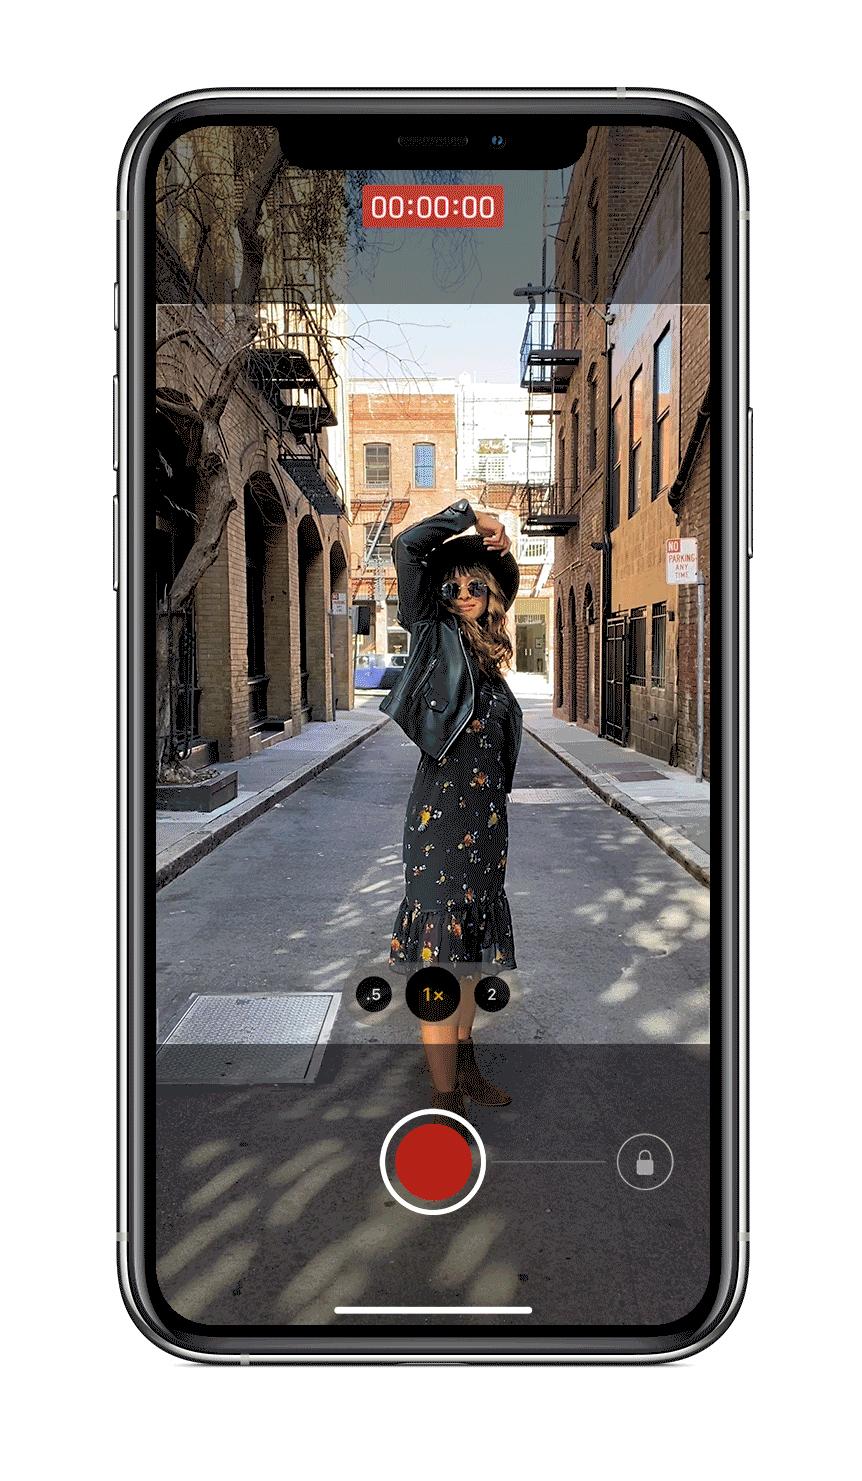 iPhone XS/XR 升级 iOS 14 后如何进行连拍?